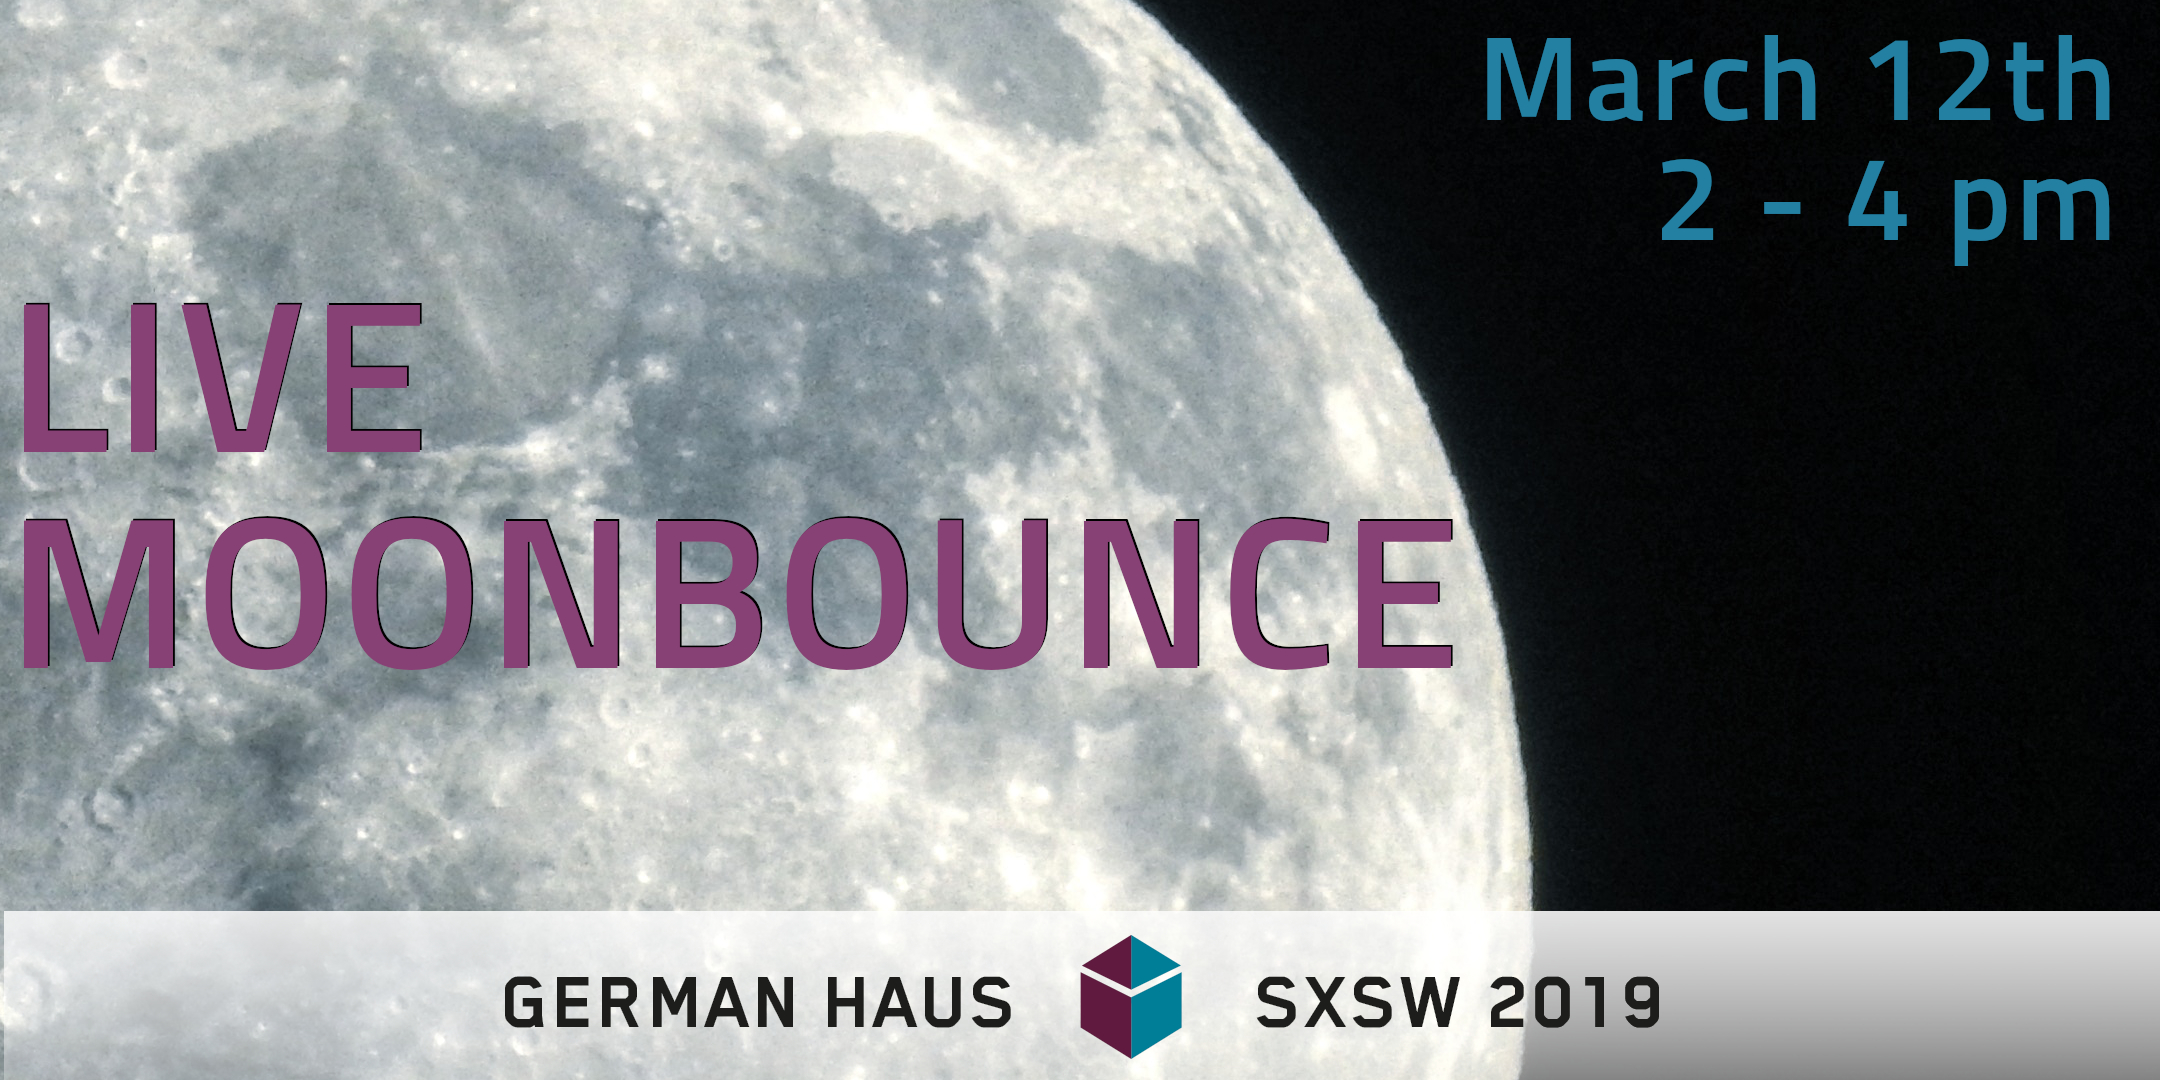 Live Moonbounce